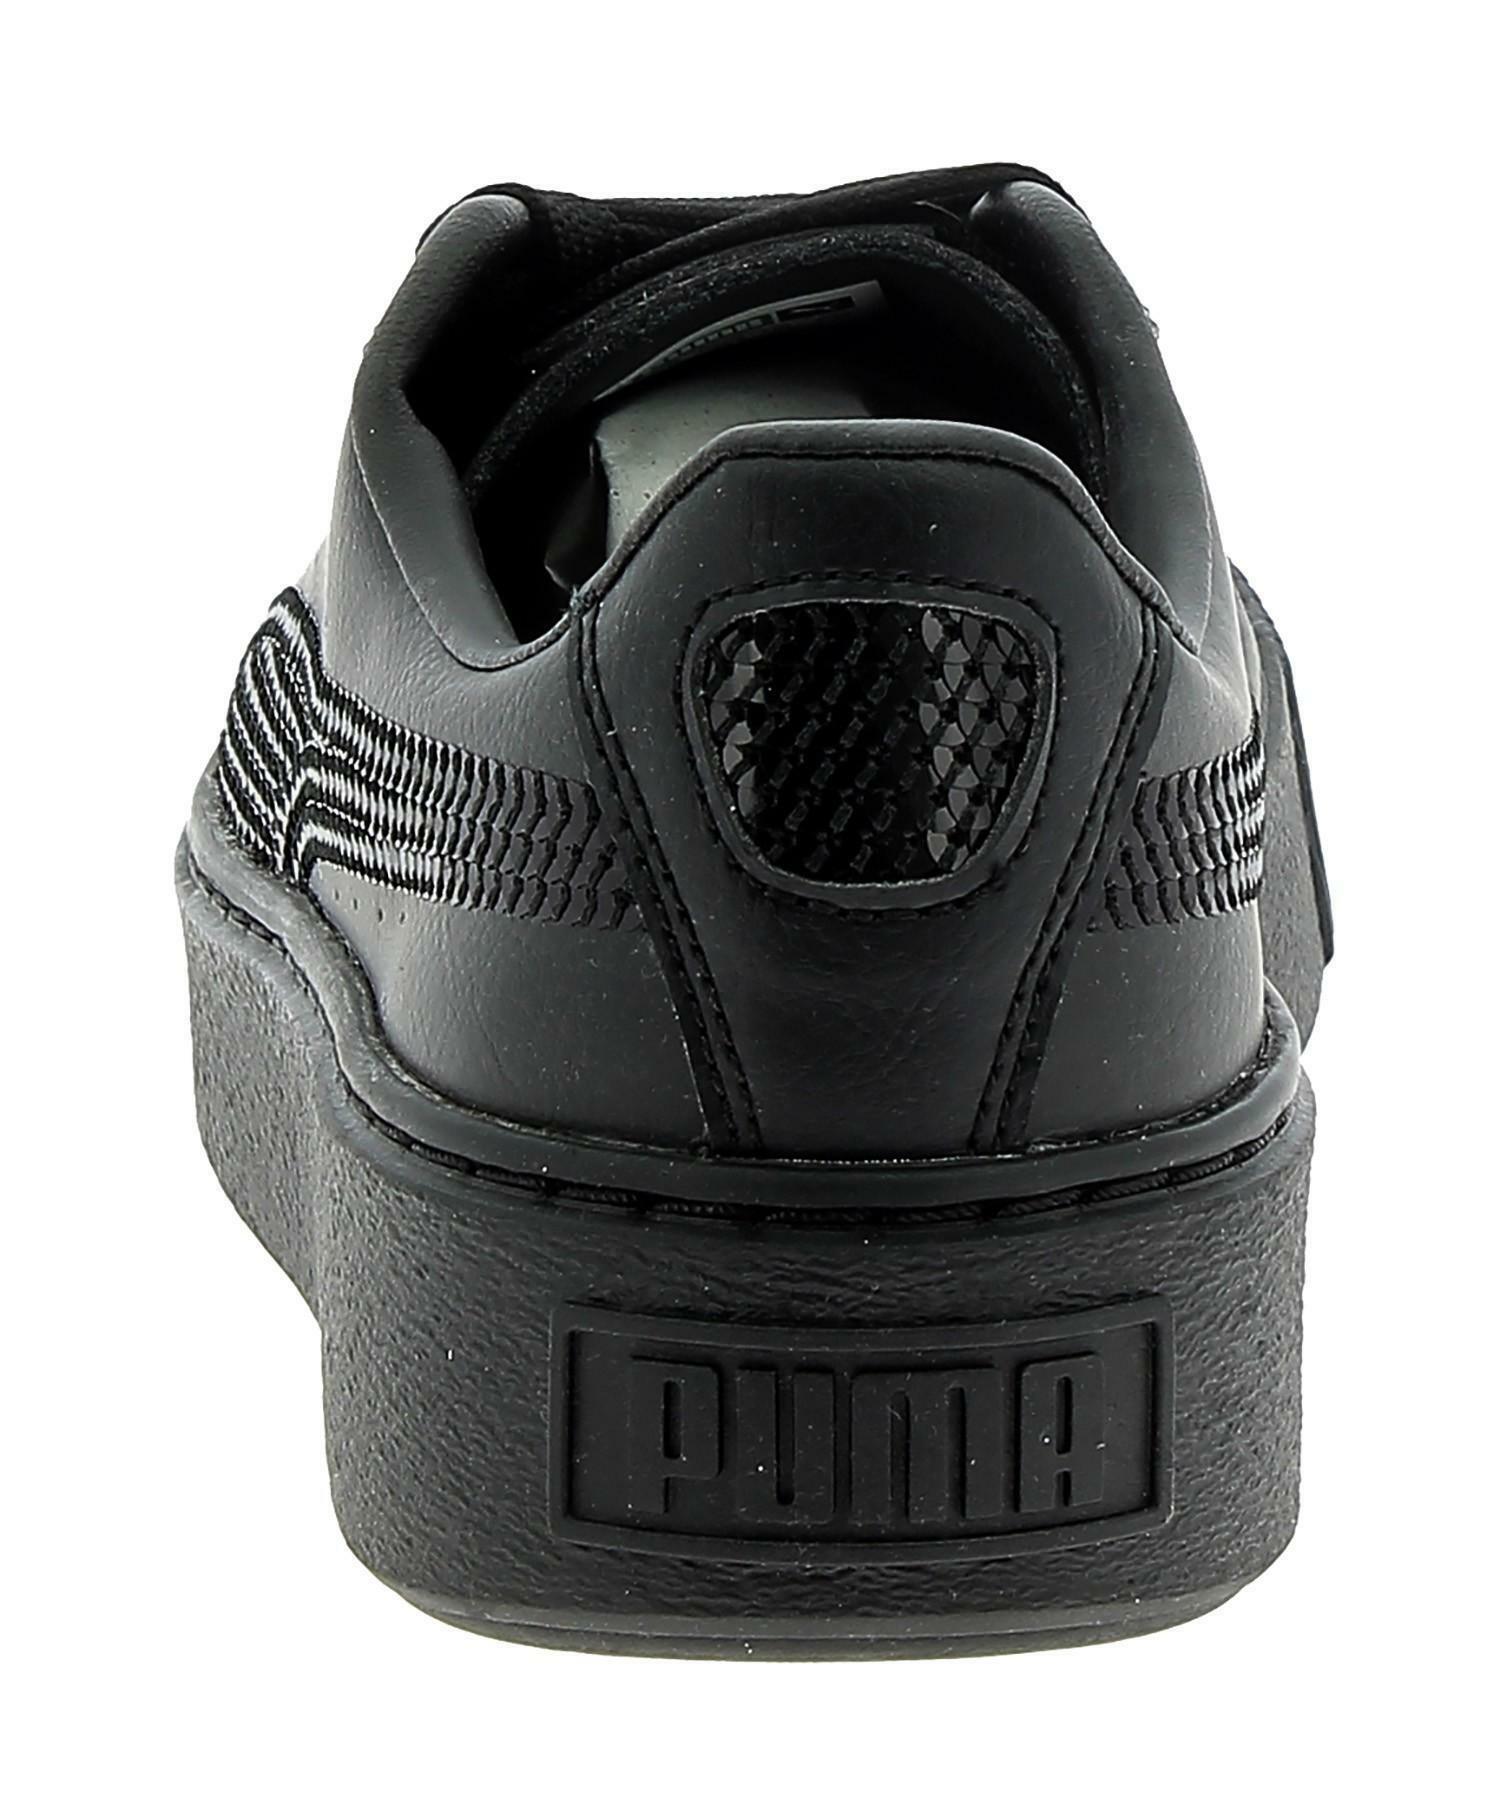 Puma platform scarpe sportive donna nere glitterate 36723701